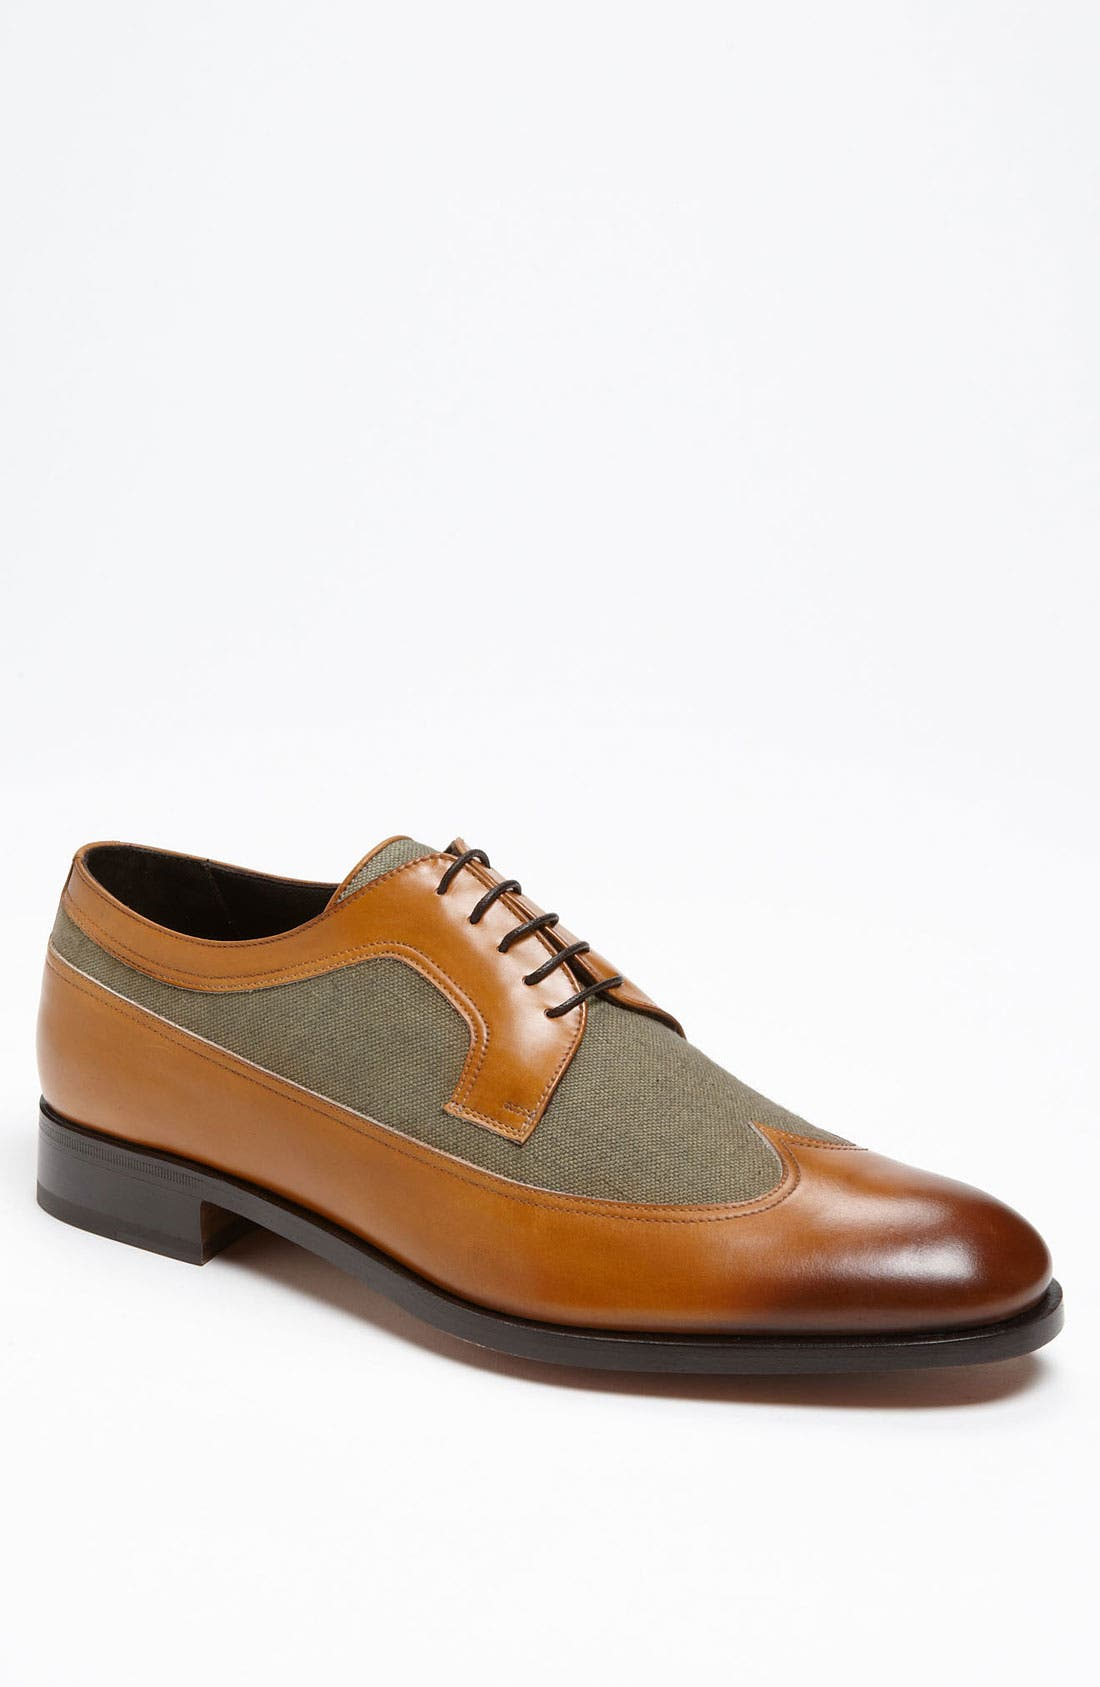 'Rudello' Longwing Oxford,                             Main thumbnail 1, color,                             Tan Calf